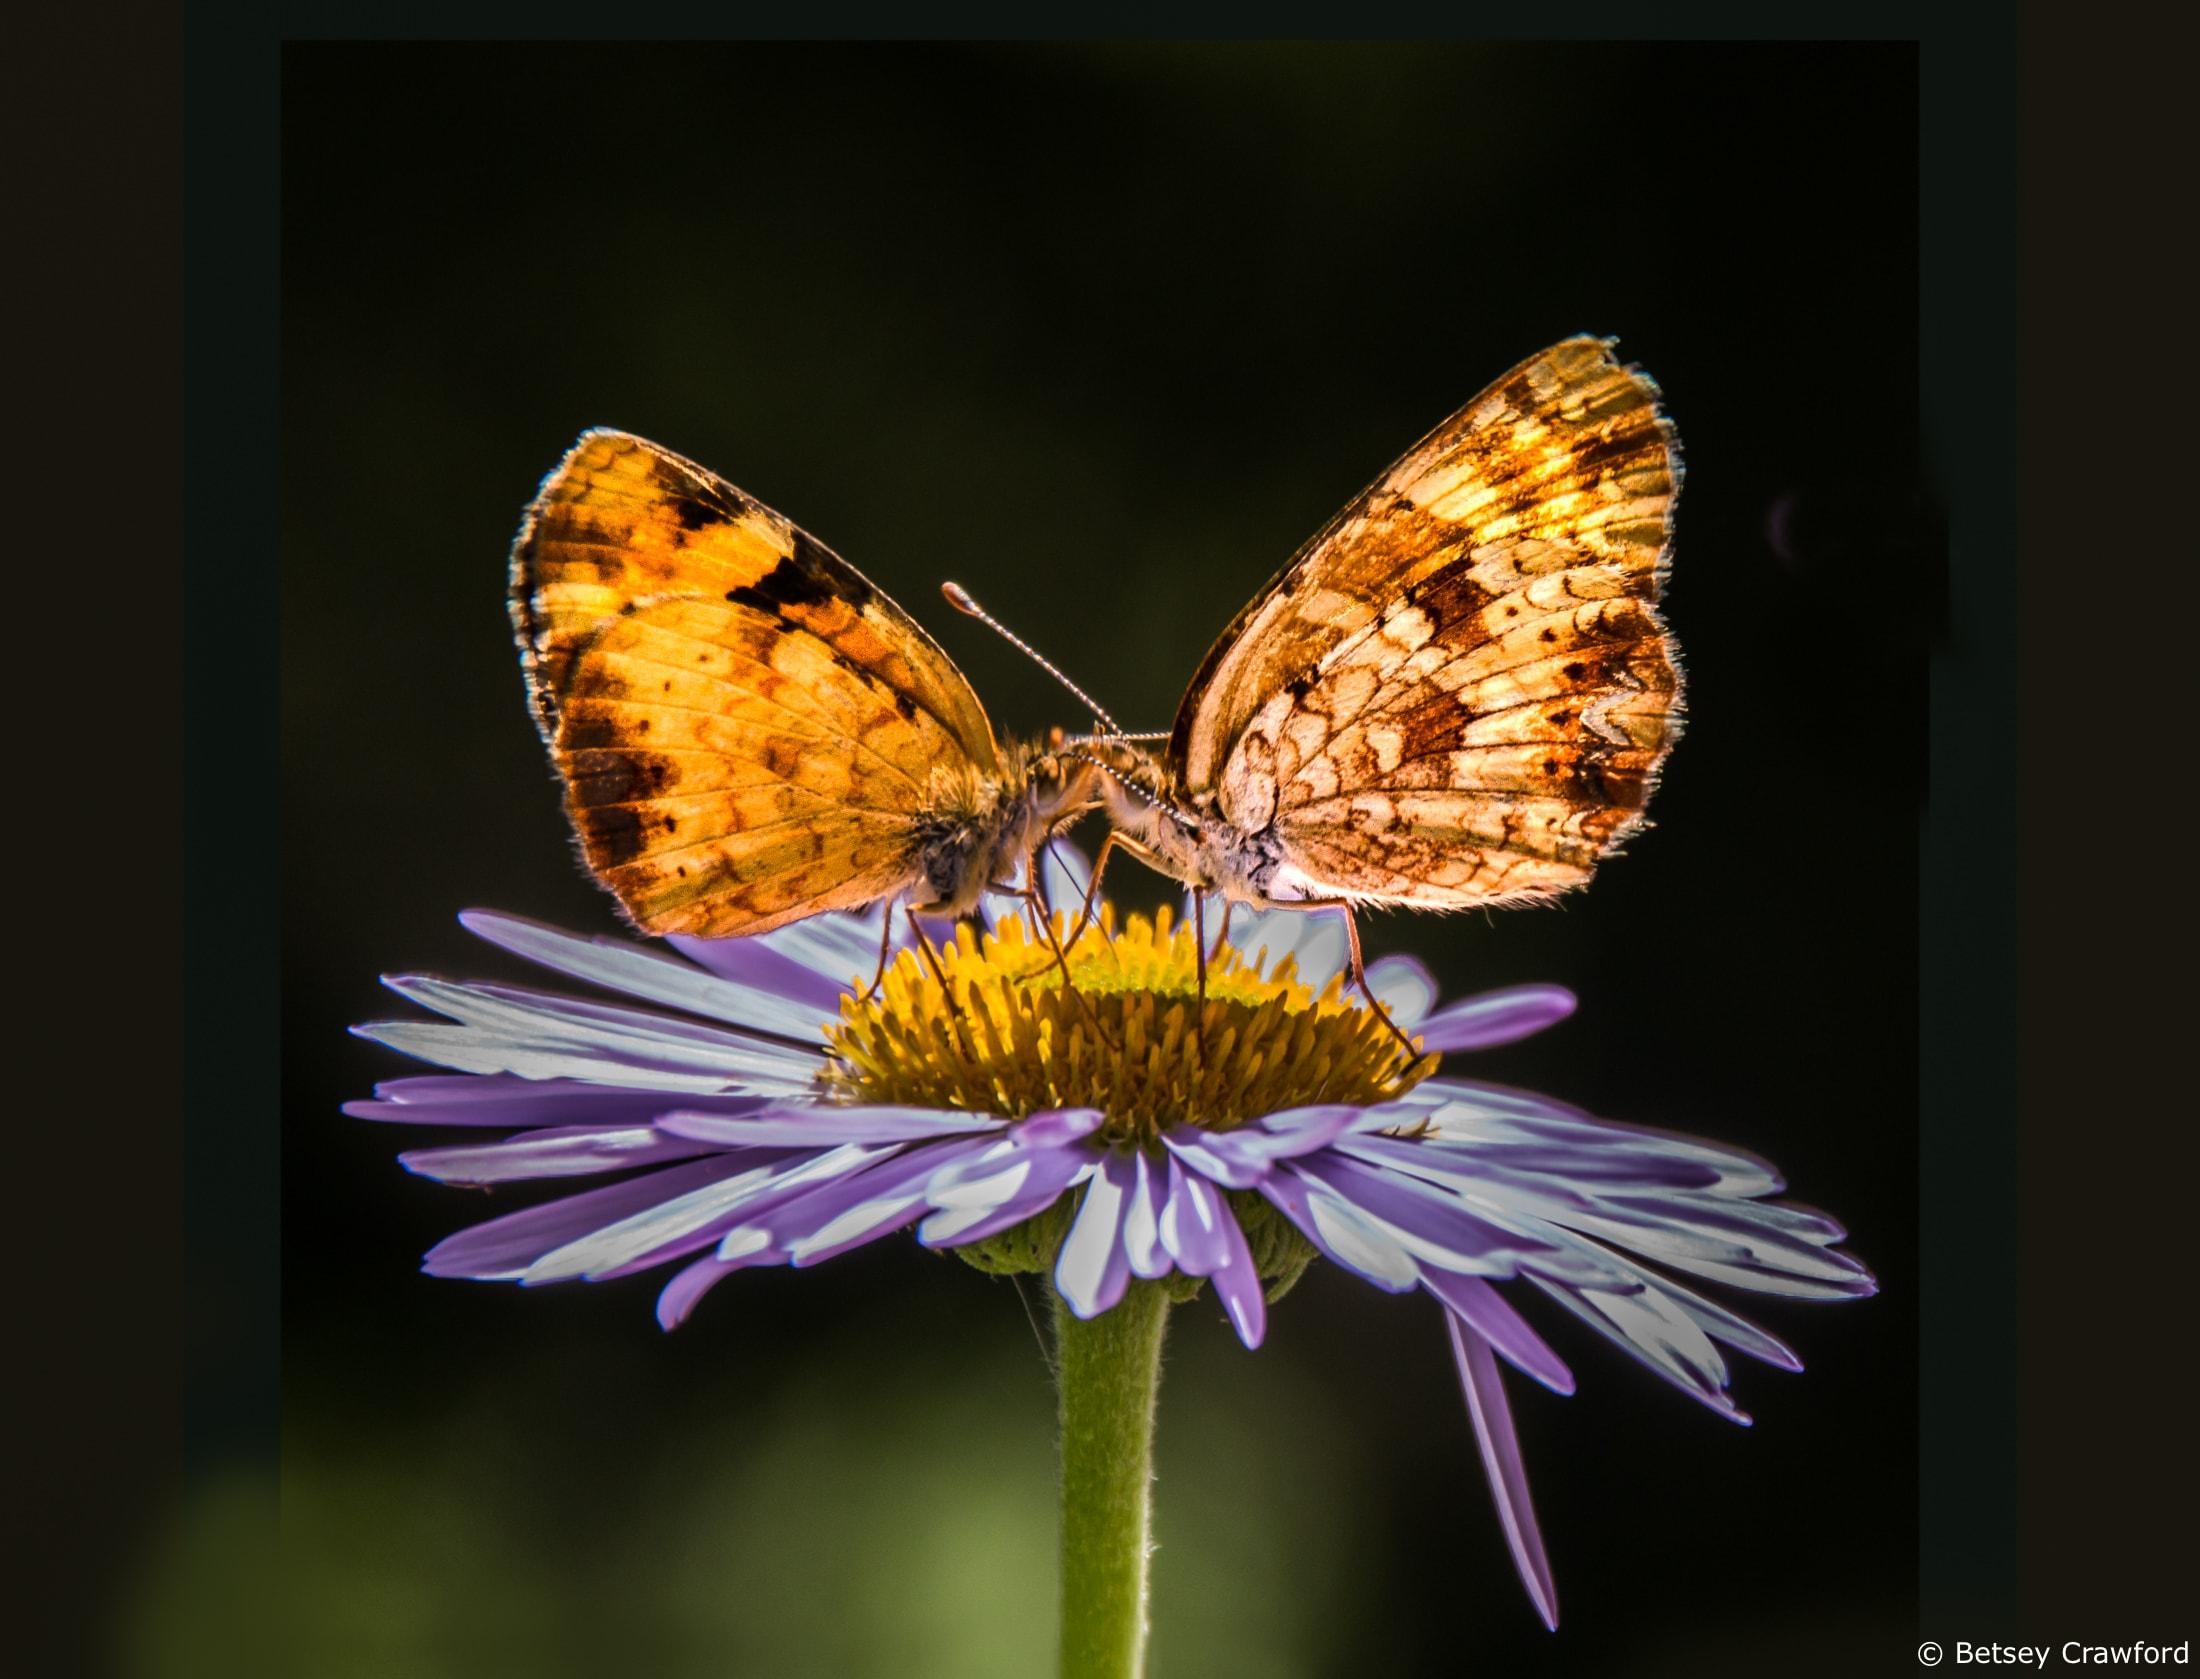 Tall purple fleabane (Erigeron peregrinus) with butterflies in Waterton Lakes National Park, Alberta, Canada